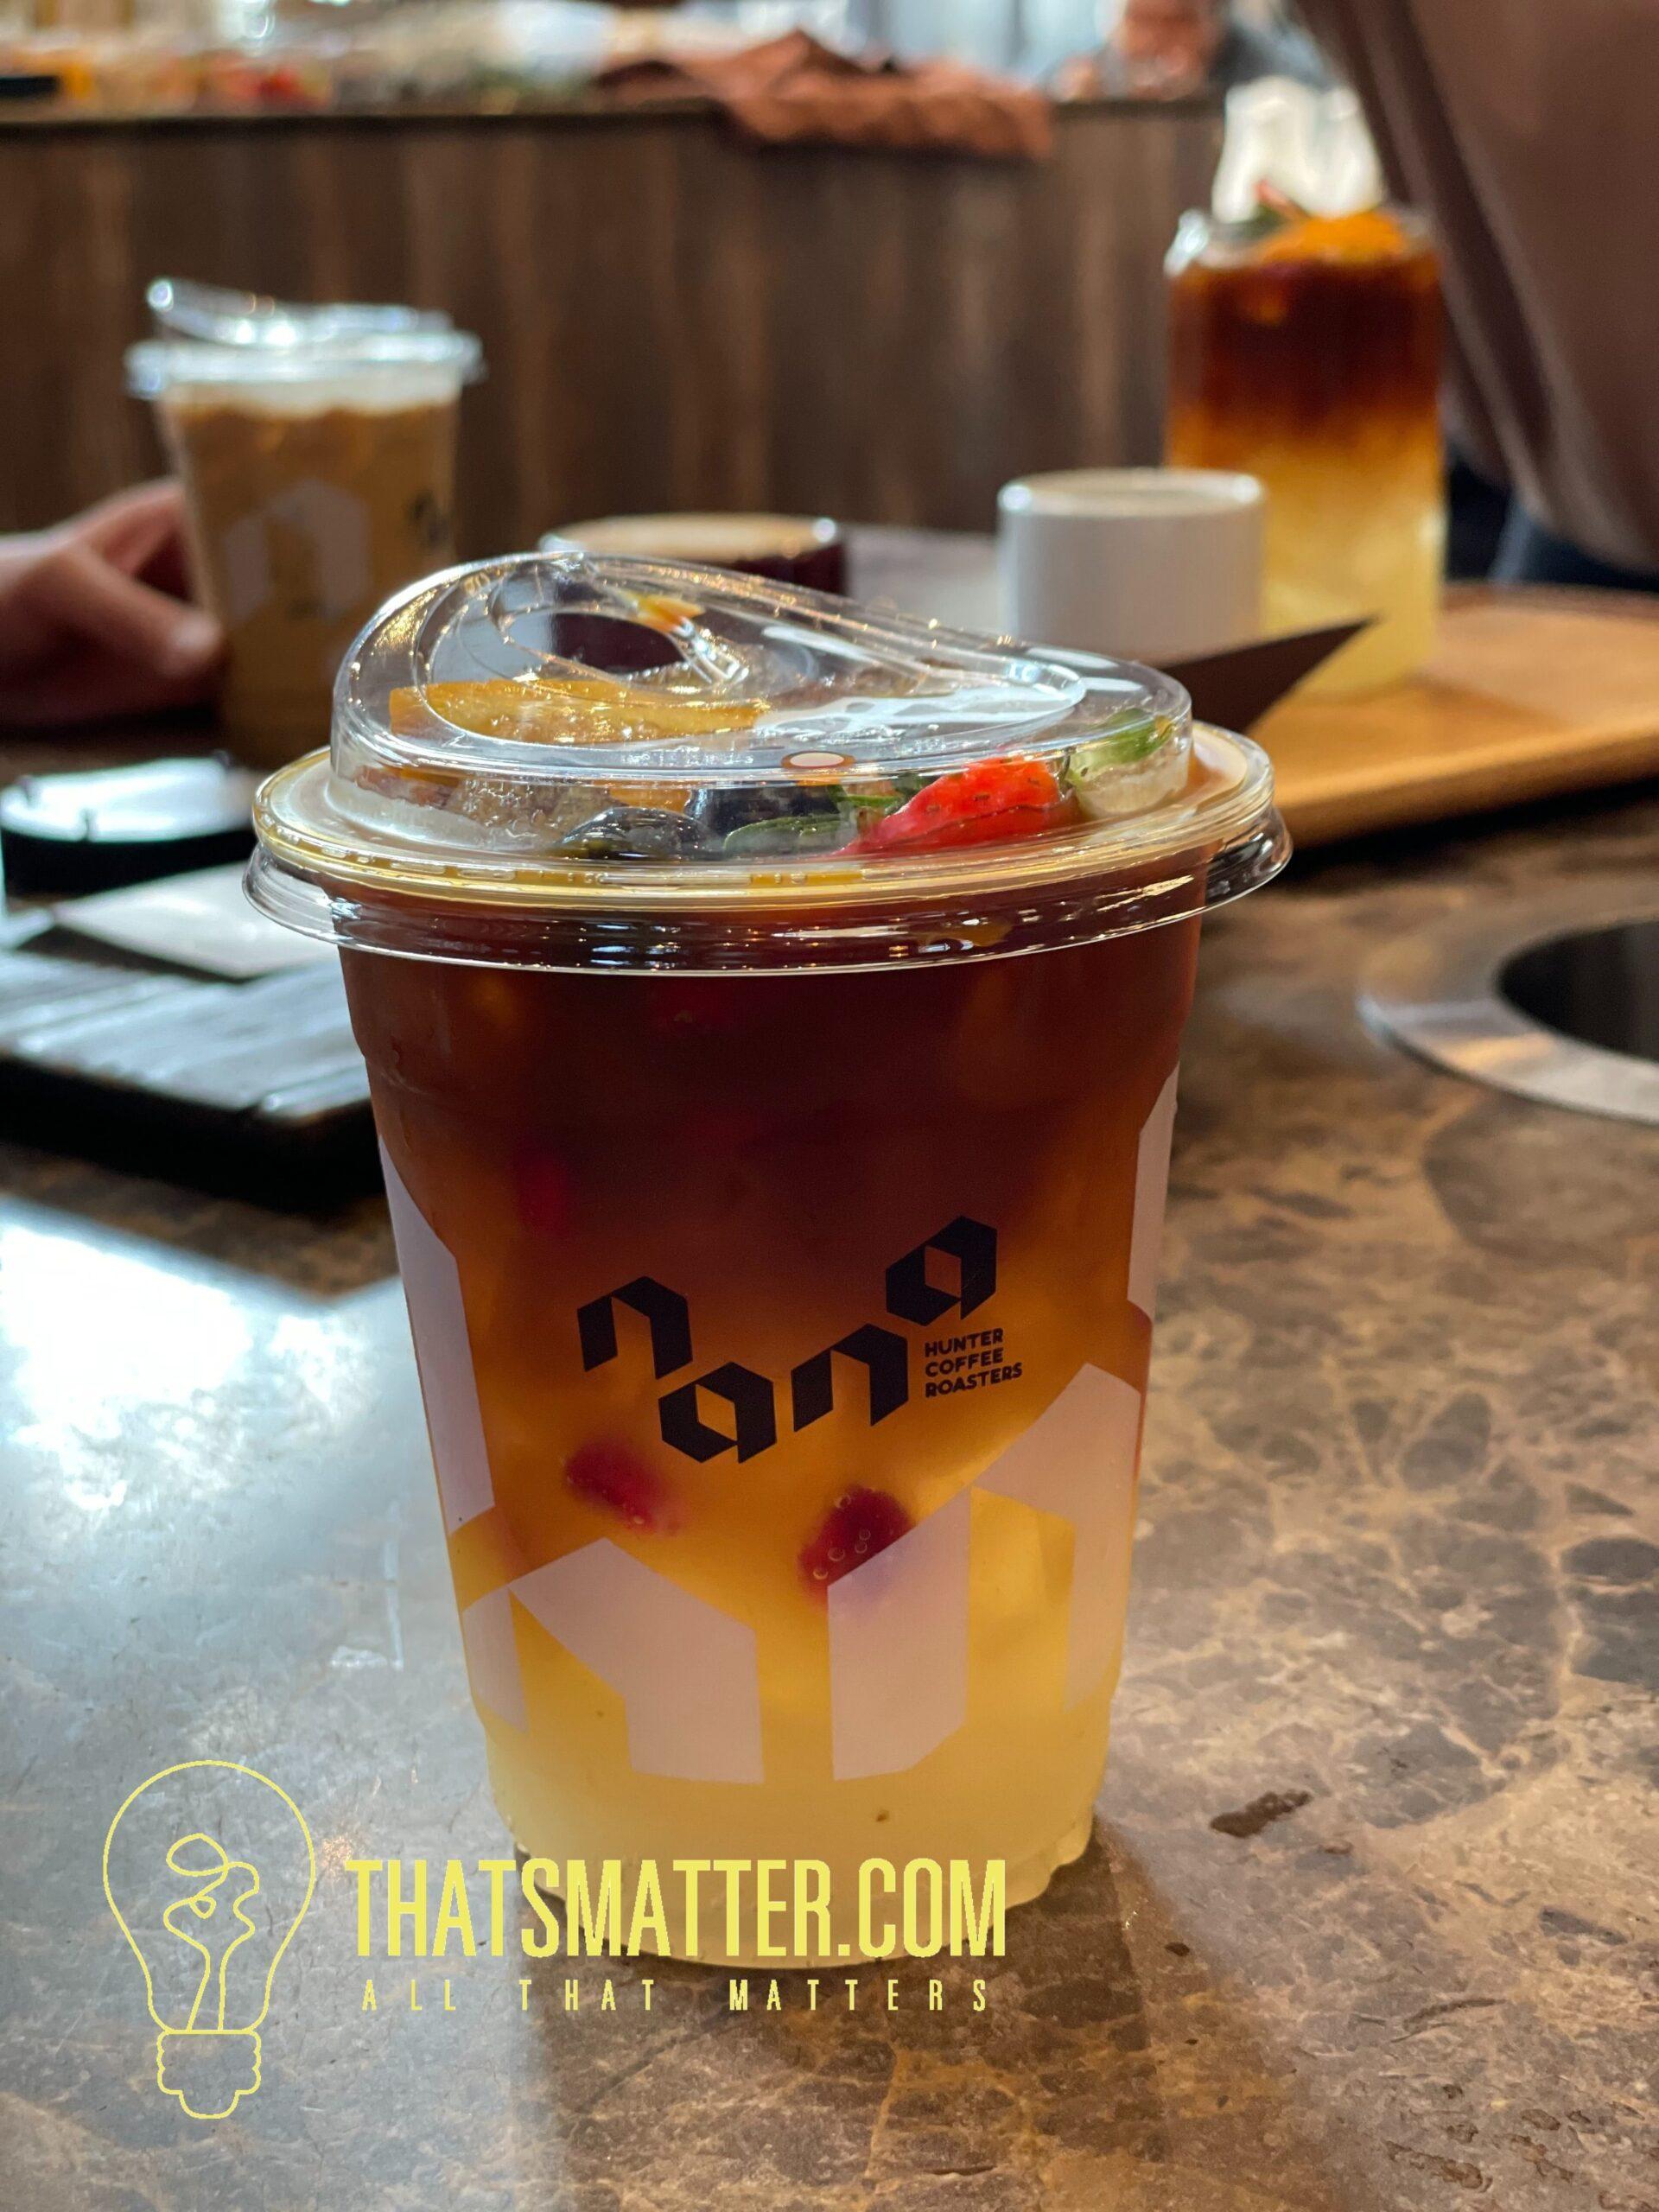 espresso shot ราดบนน้ำส้มยูซุกับโซดา